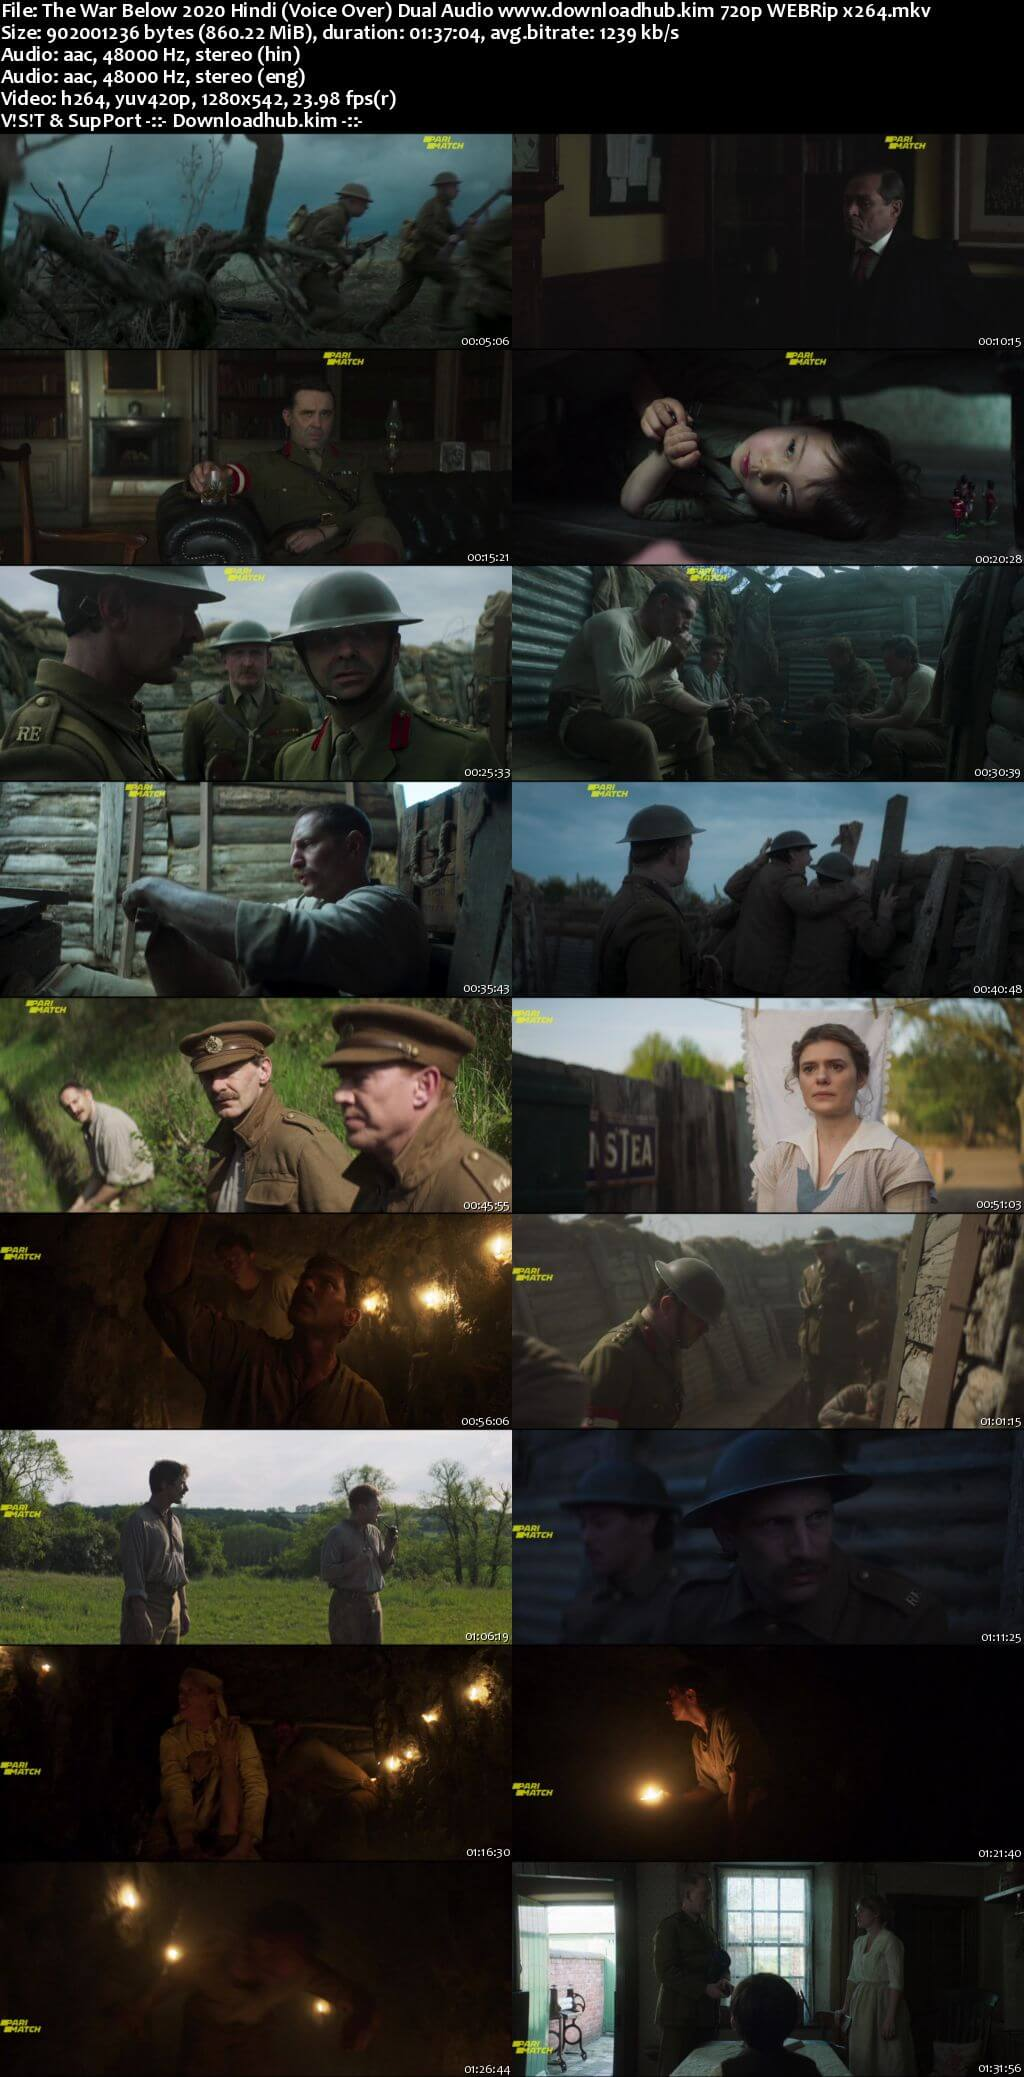 The War Below 2020 Hindi (Voice Over) Dual Audio 720p WEBRip x264